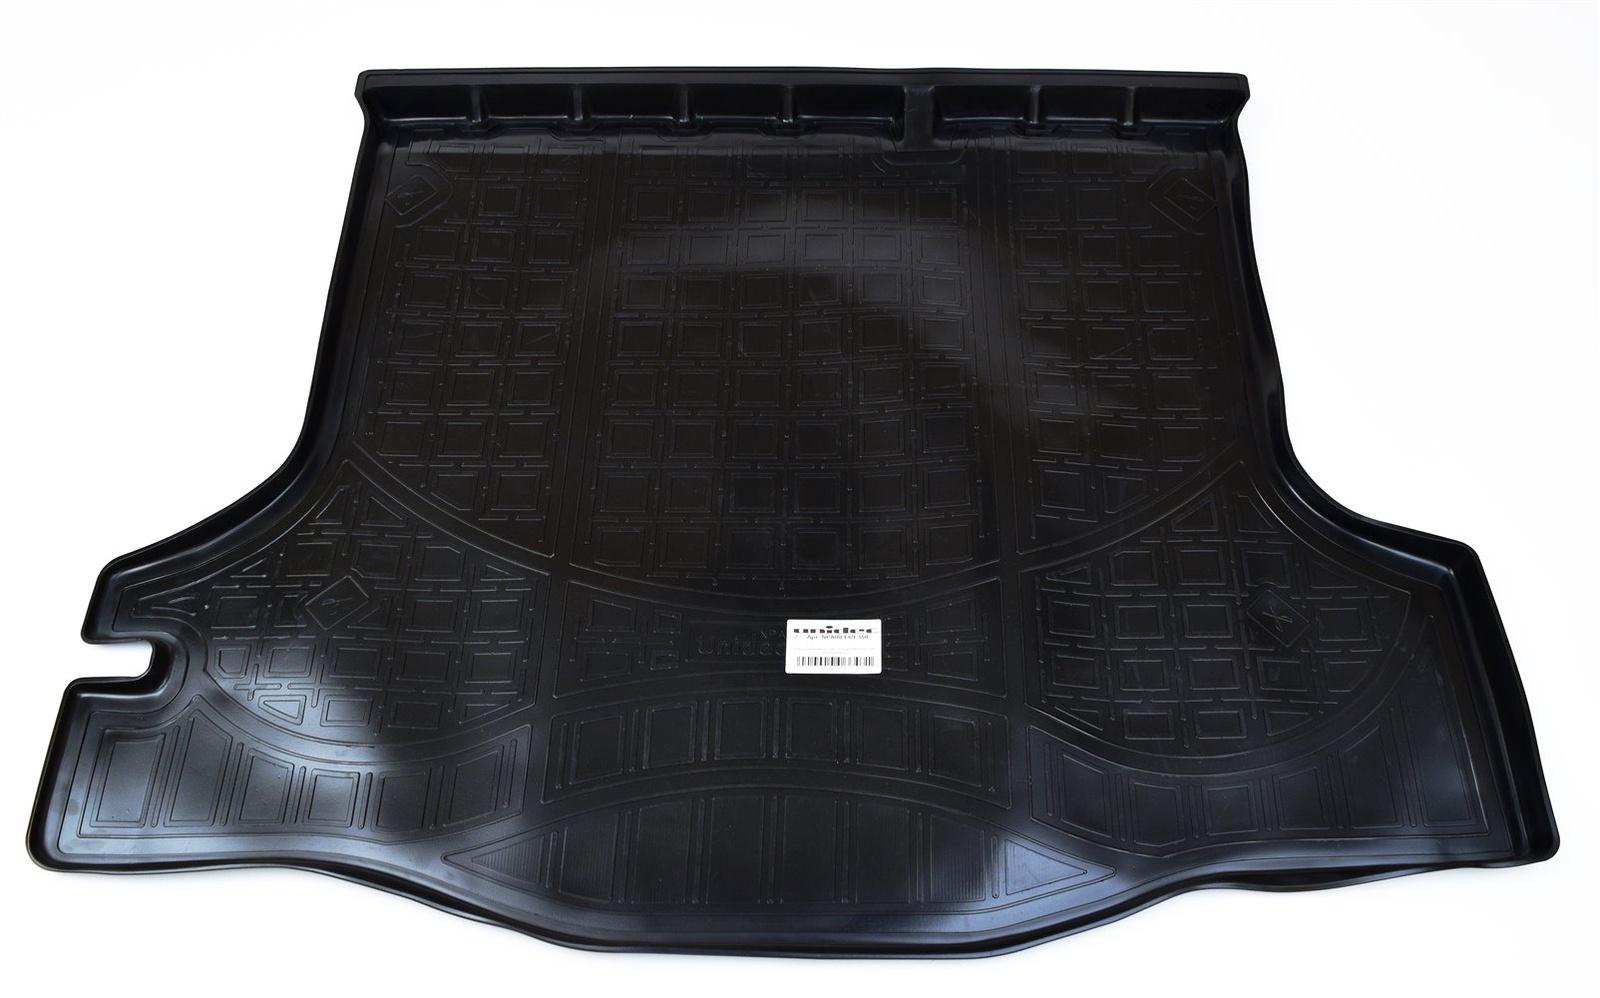 Коврик багажника Norplast для Kia cee'd wag/Kia cee'd sw jd 2012, npa00-e43-051, черный цена и фото